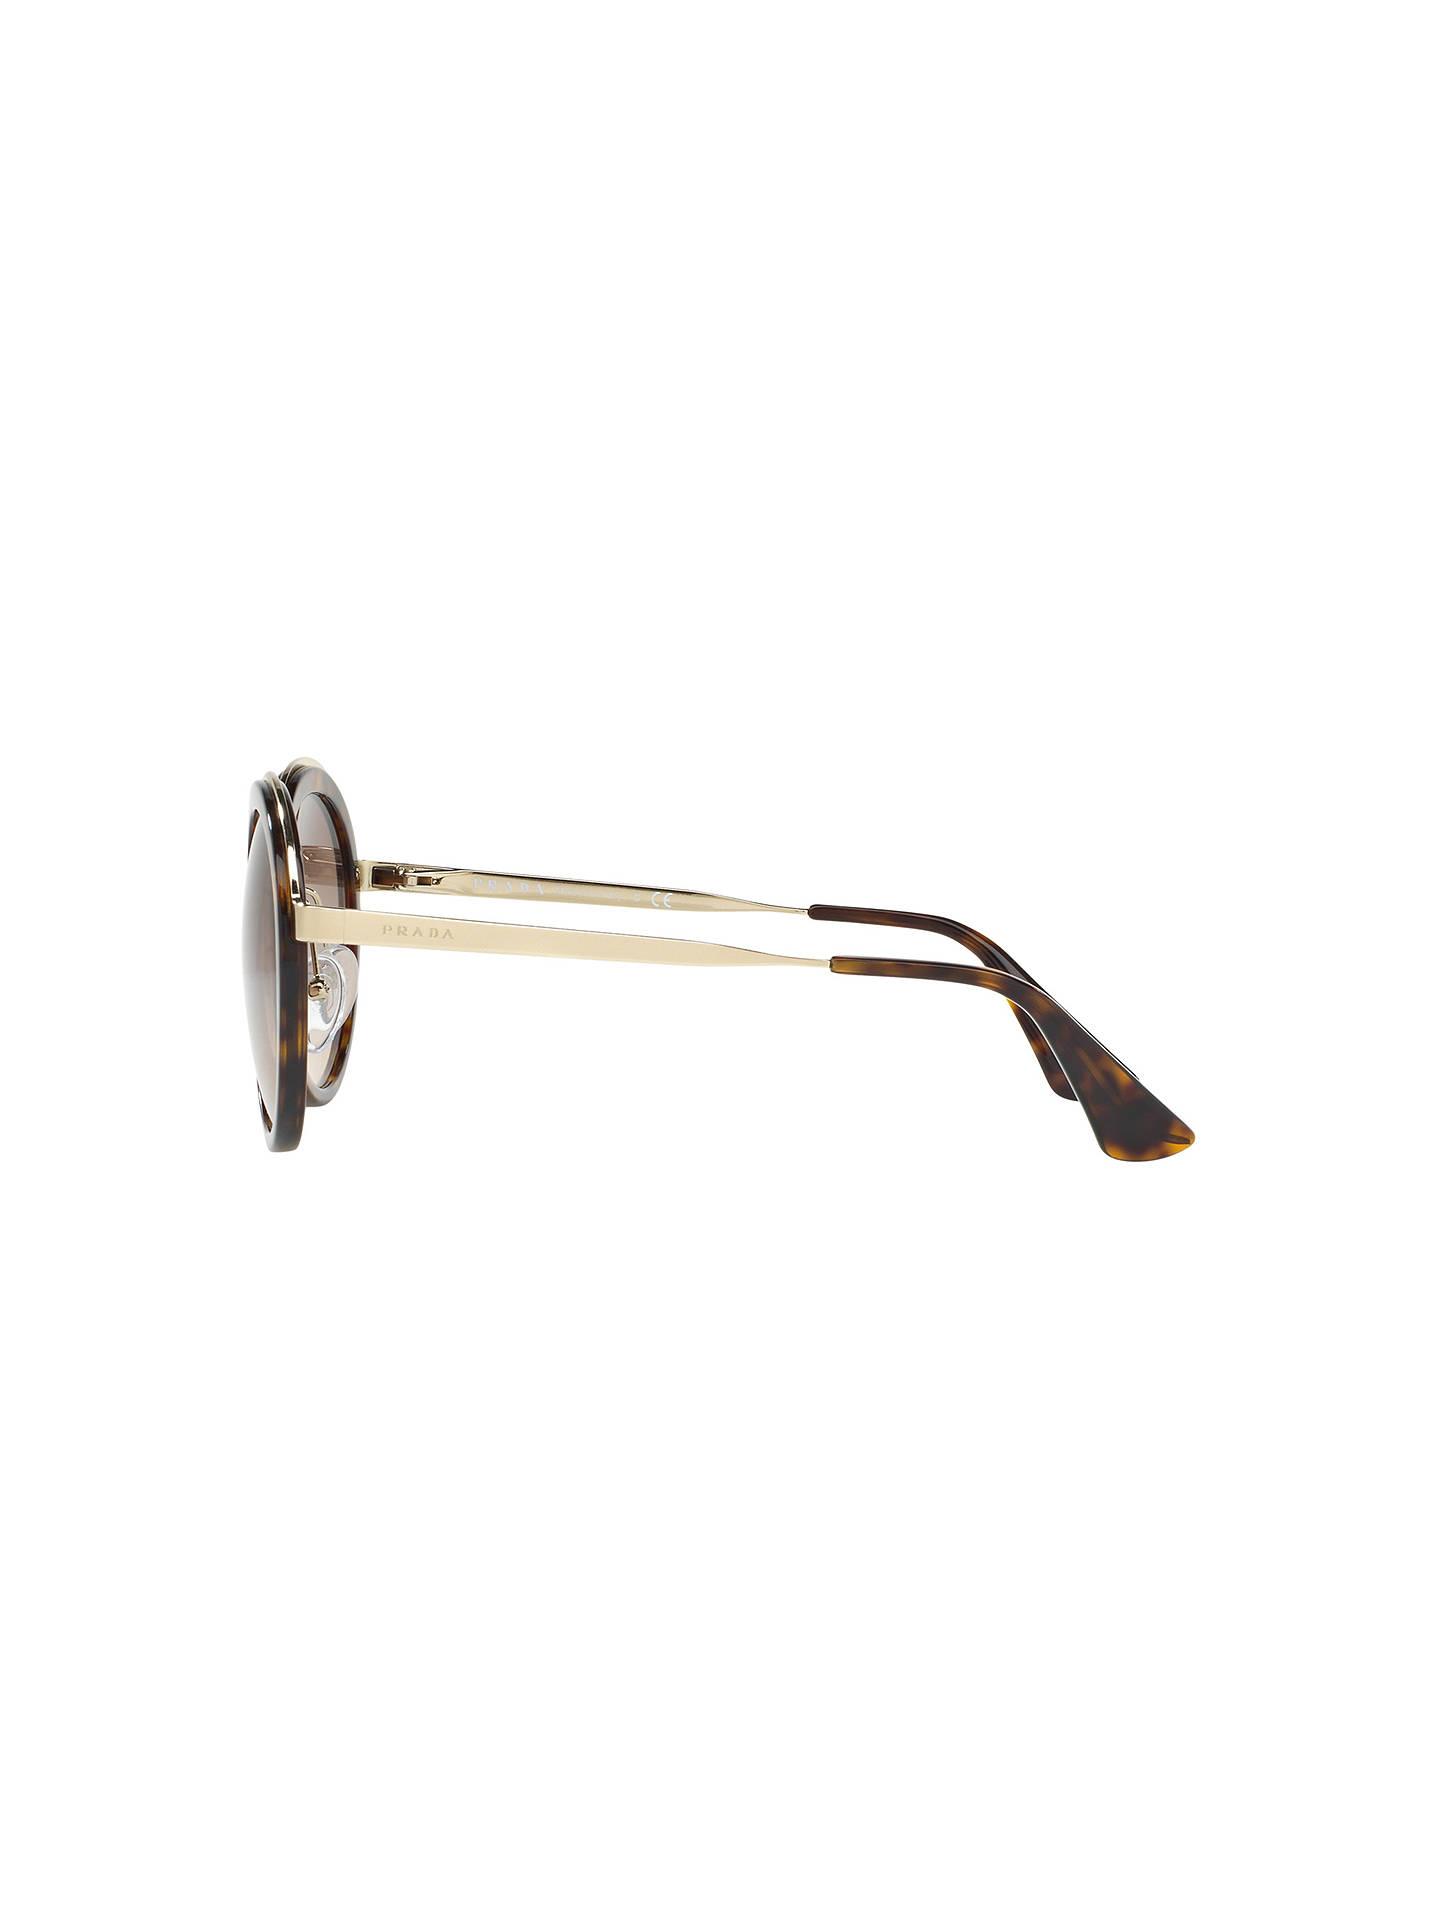 05732bb169d7 Prada PR 50TS Round Sunglasses at John Lewis   Partners